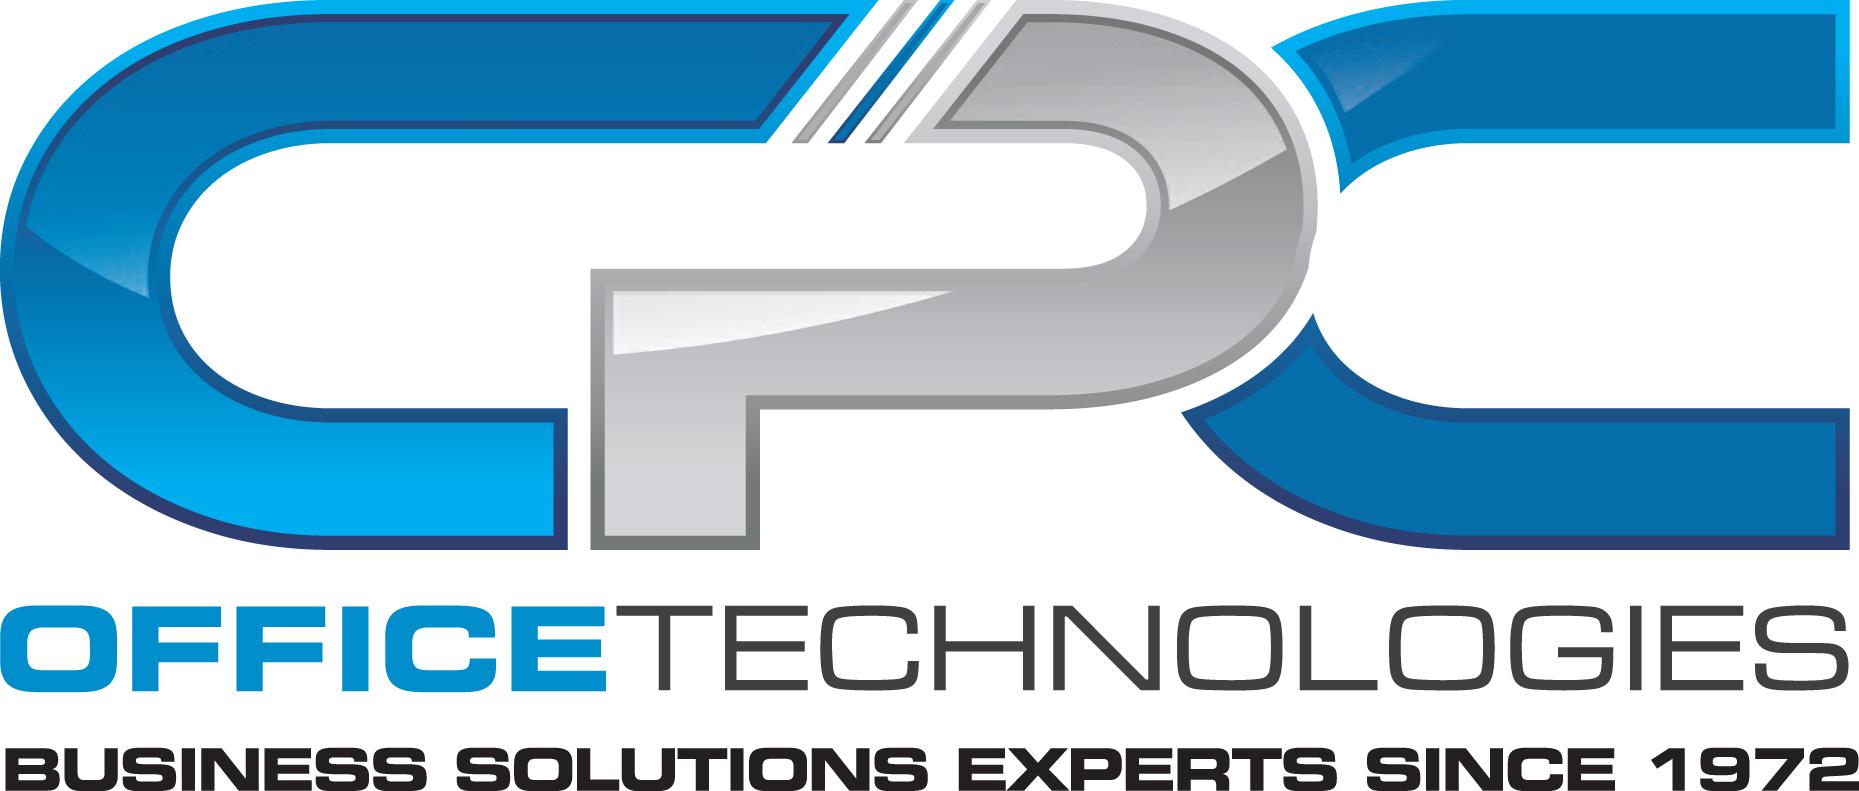 CPC Office Technologies.jpg